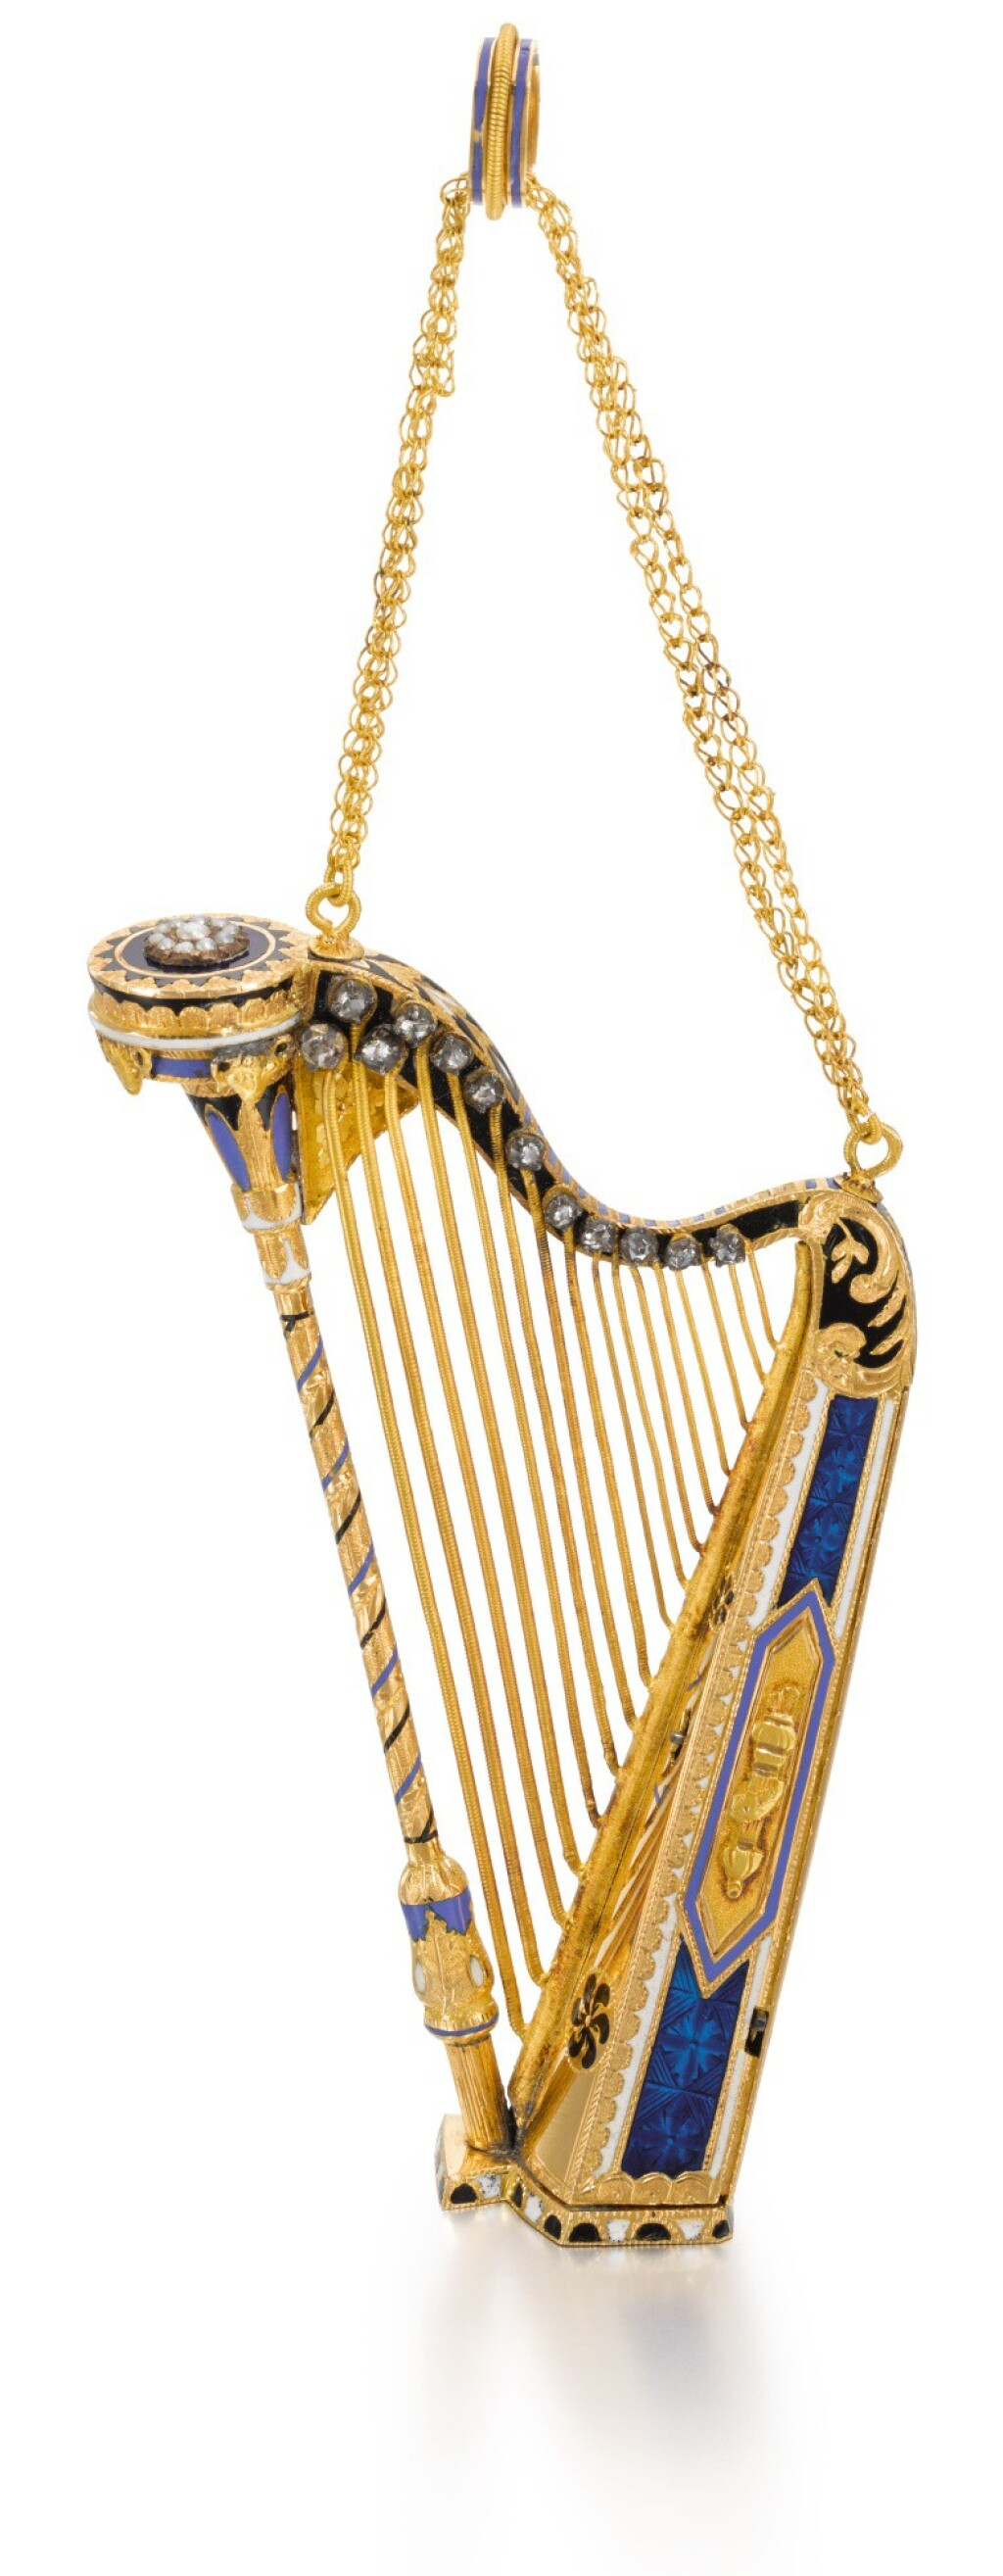 SWISS | A GOLD, ENAMEL AND DIAMOND-SET MUSICAL HARP  CIRCA 1810